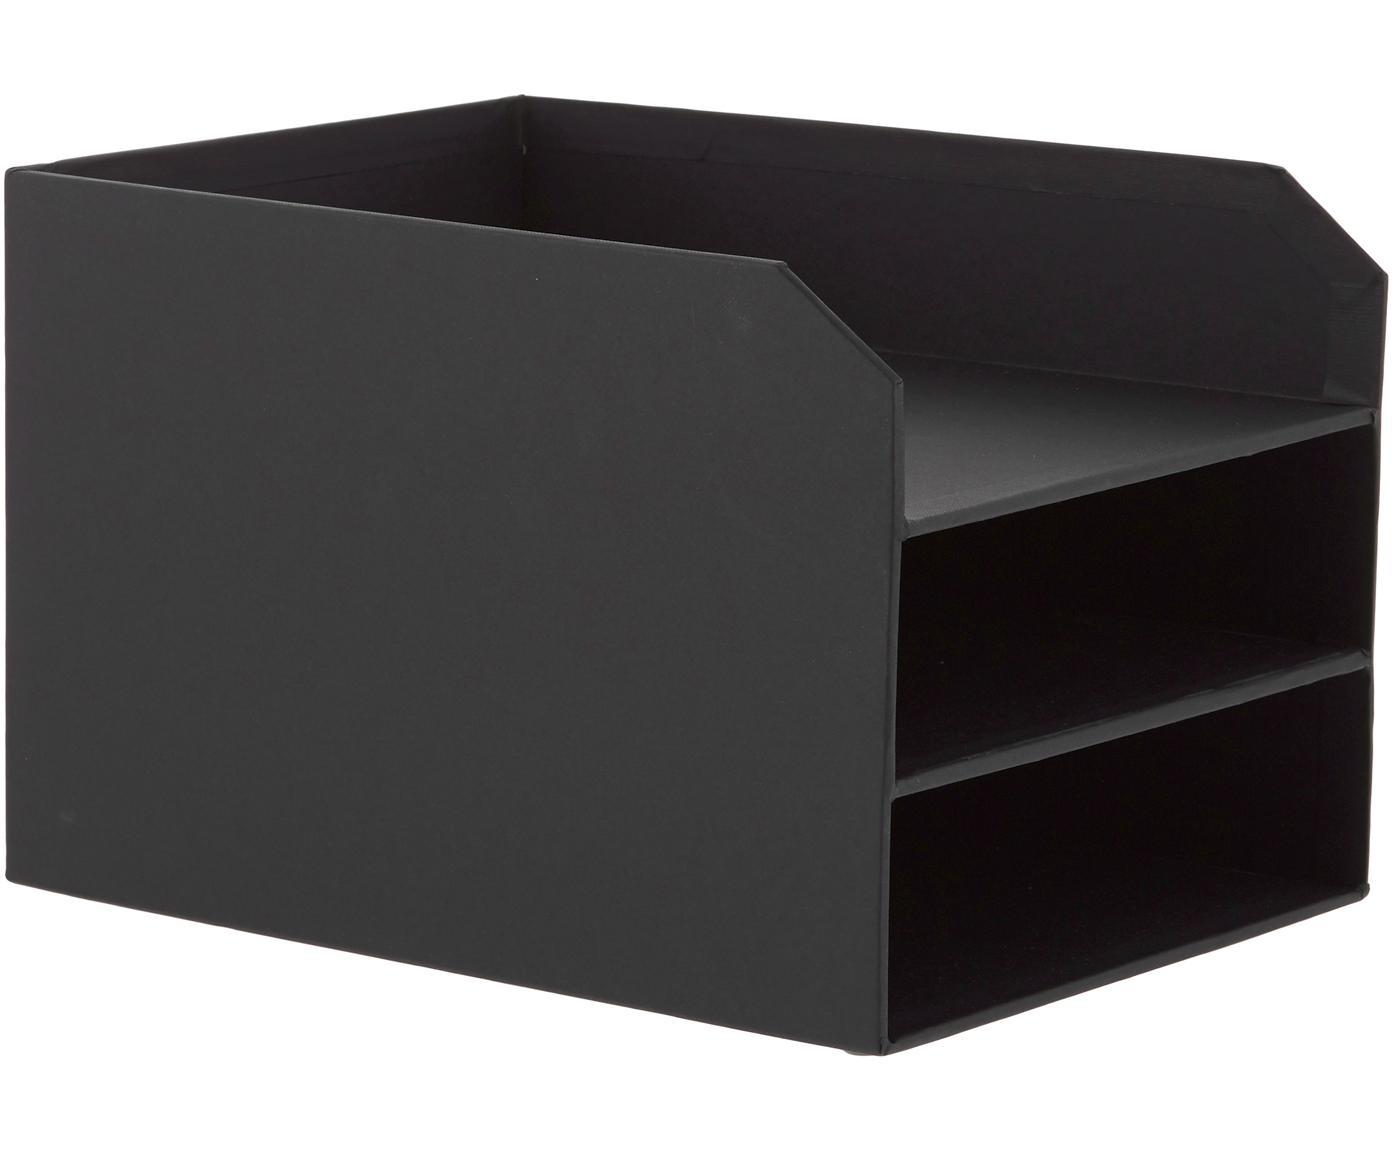 Documentenhouder Trey, Massief, gelamineerd karton, Zwart, 23 x 21 cm